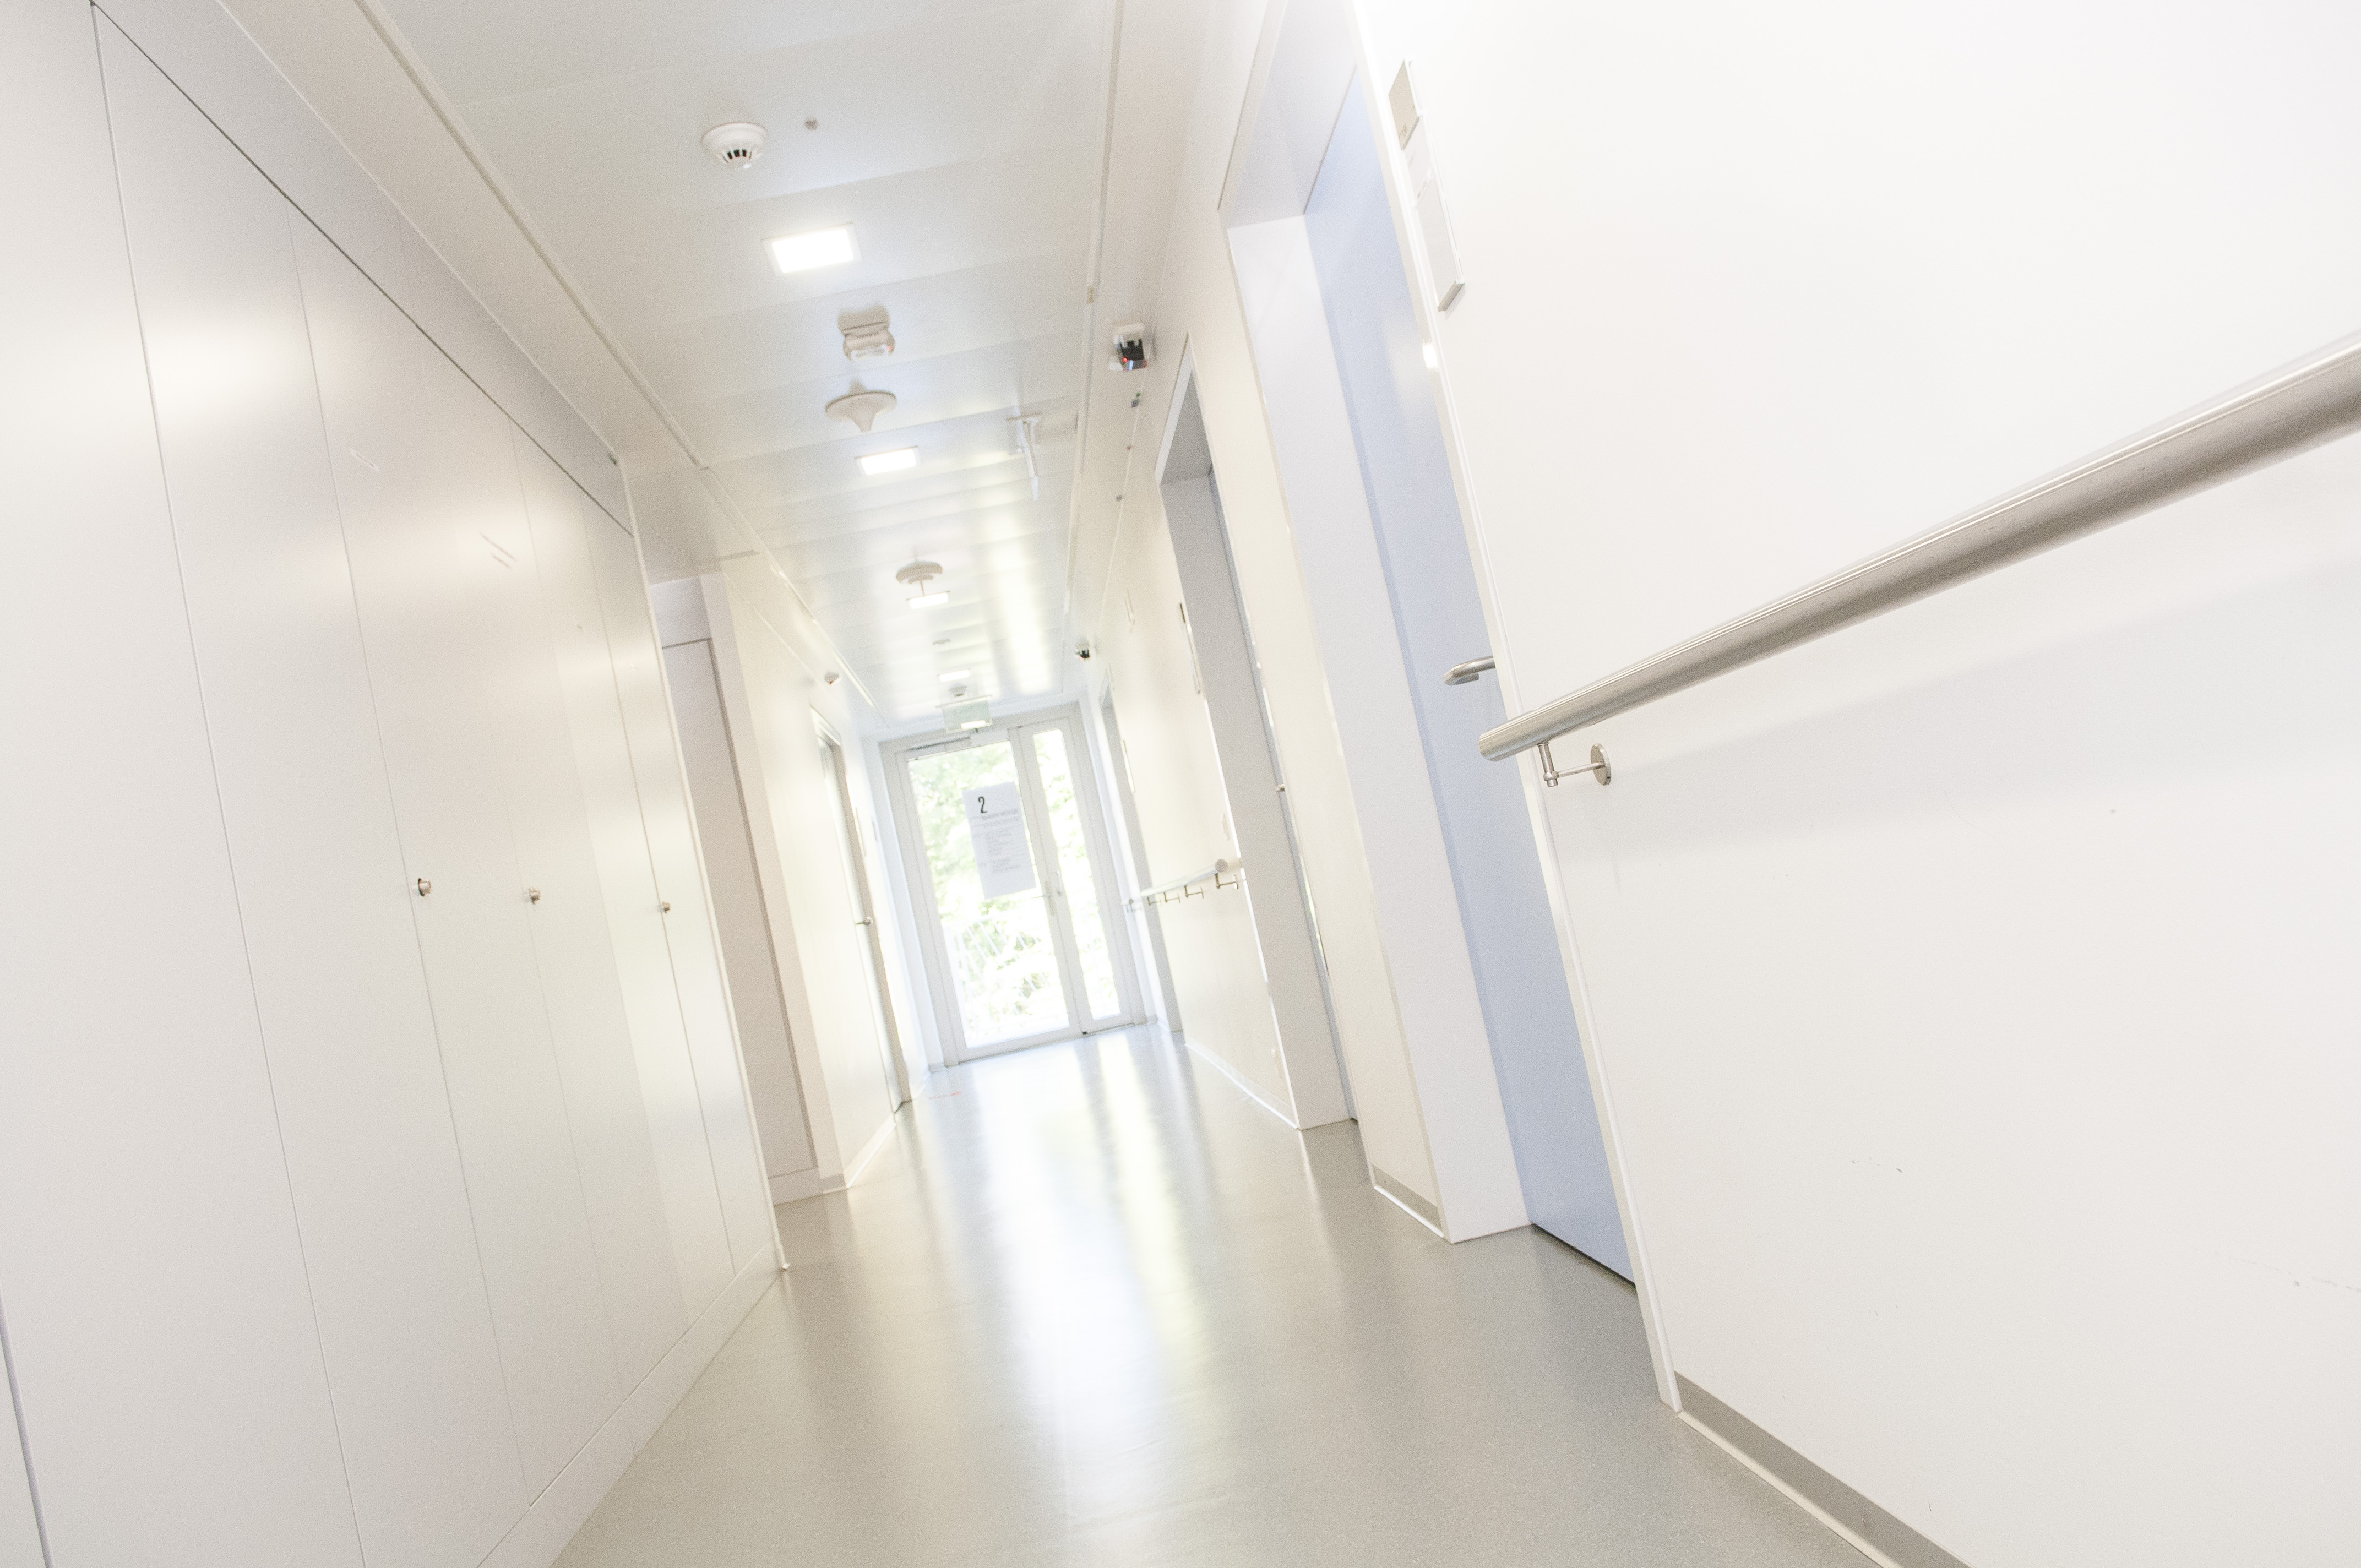 Hôpital psychiatrique, Prangins